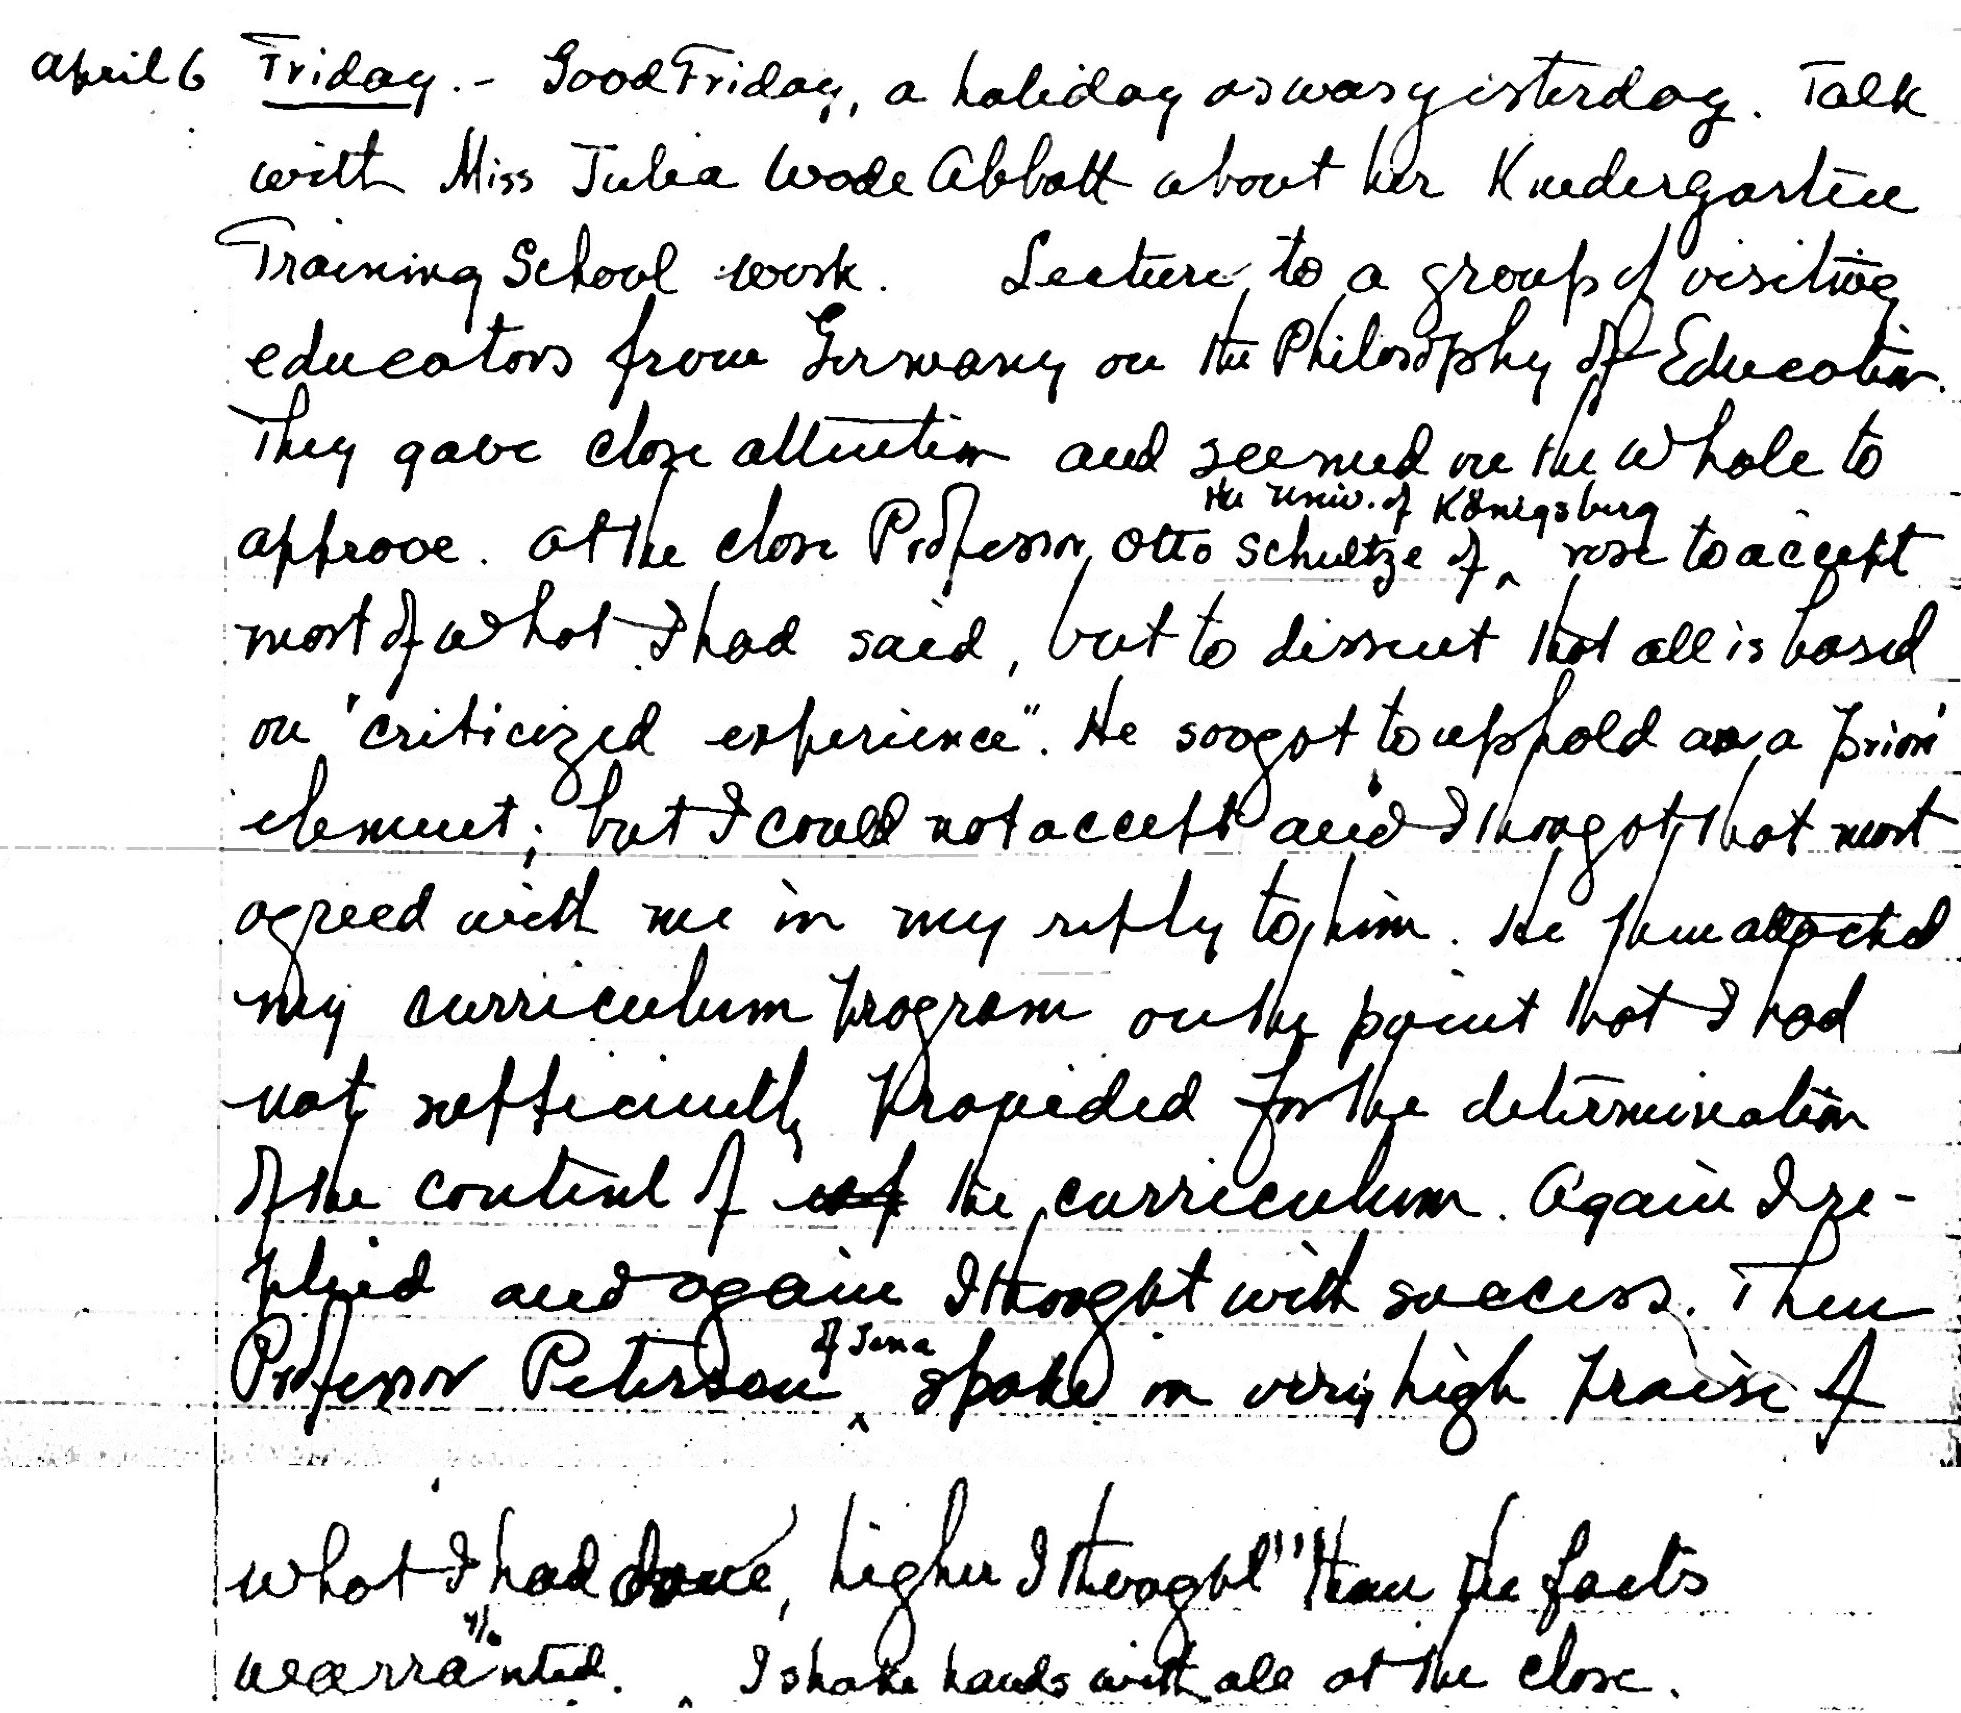 Figure 2: Mention of Peter Petersen in Kilpatrick's diary (vol. 24), April 6, 1928 (Source: GL-TCCU [GotLib])